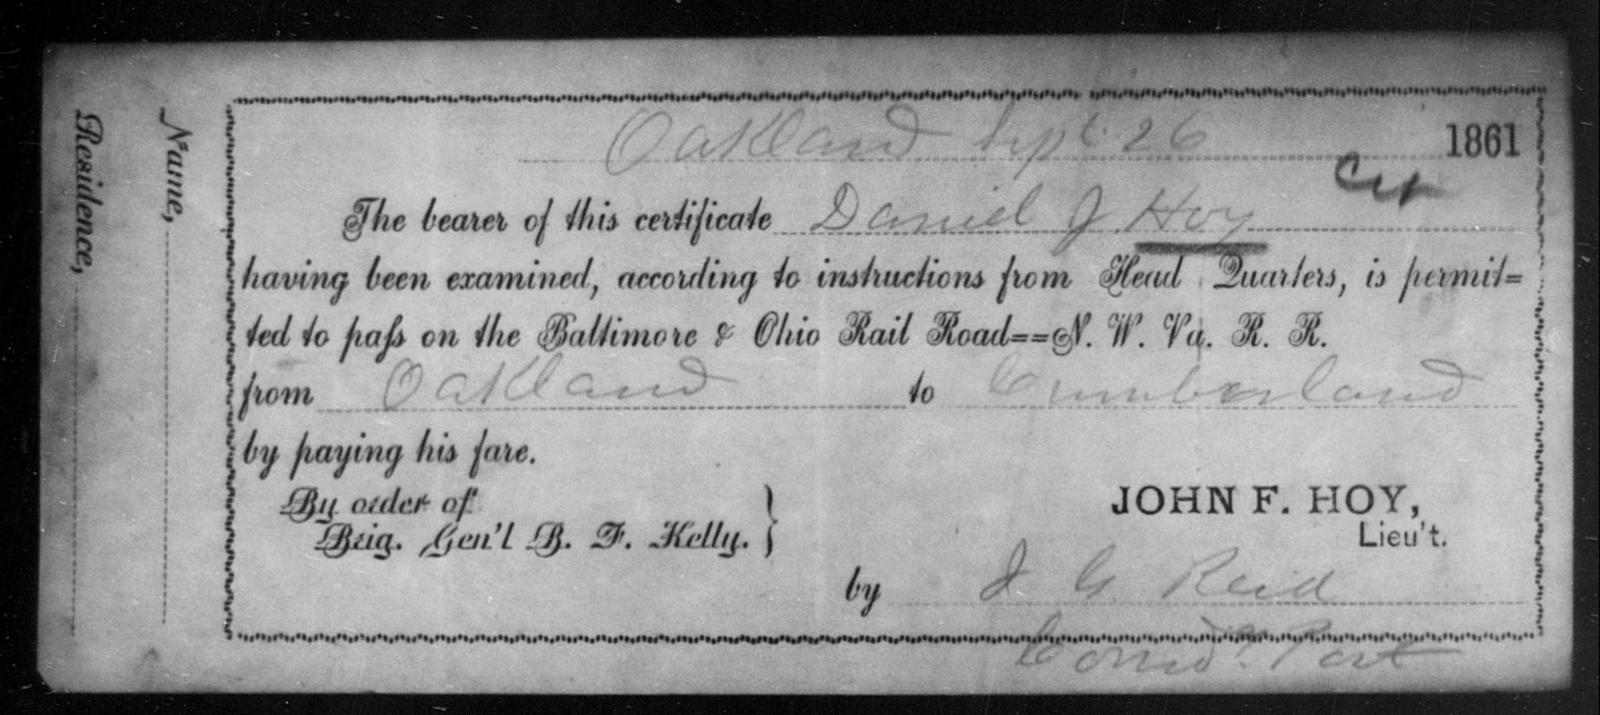 Hoy, Daniel J - State: Ohio - Year: 1861